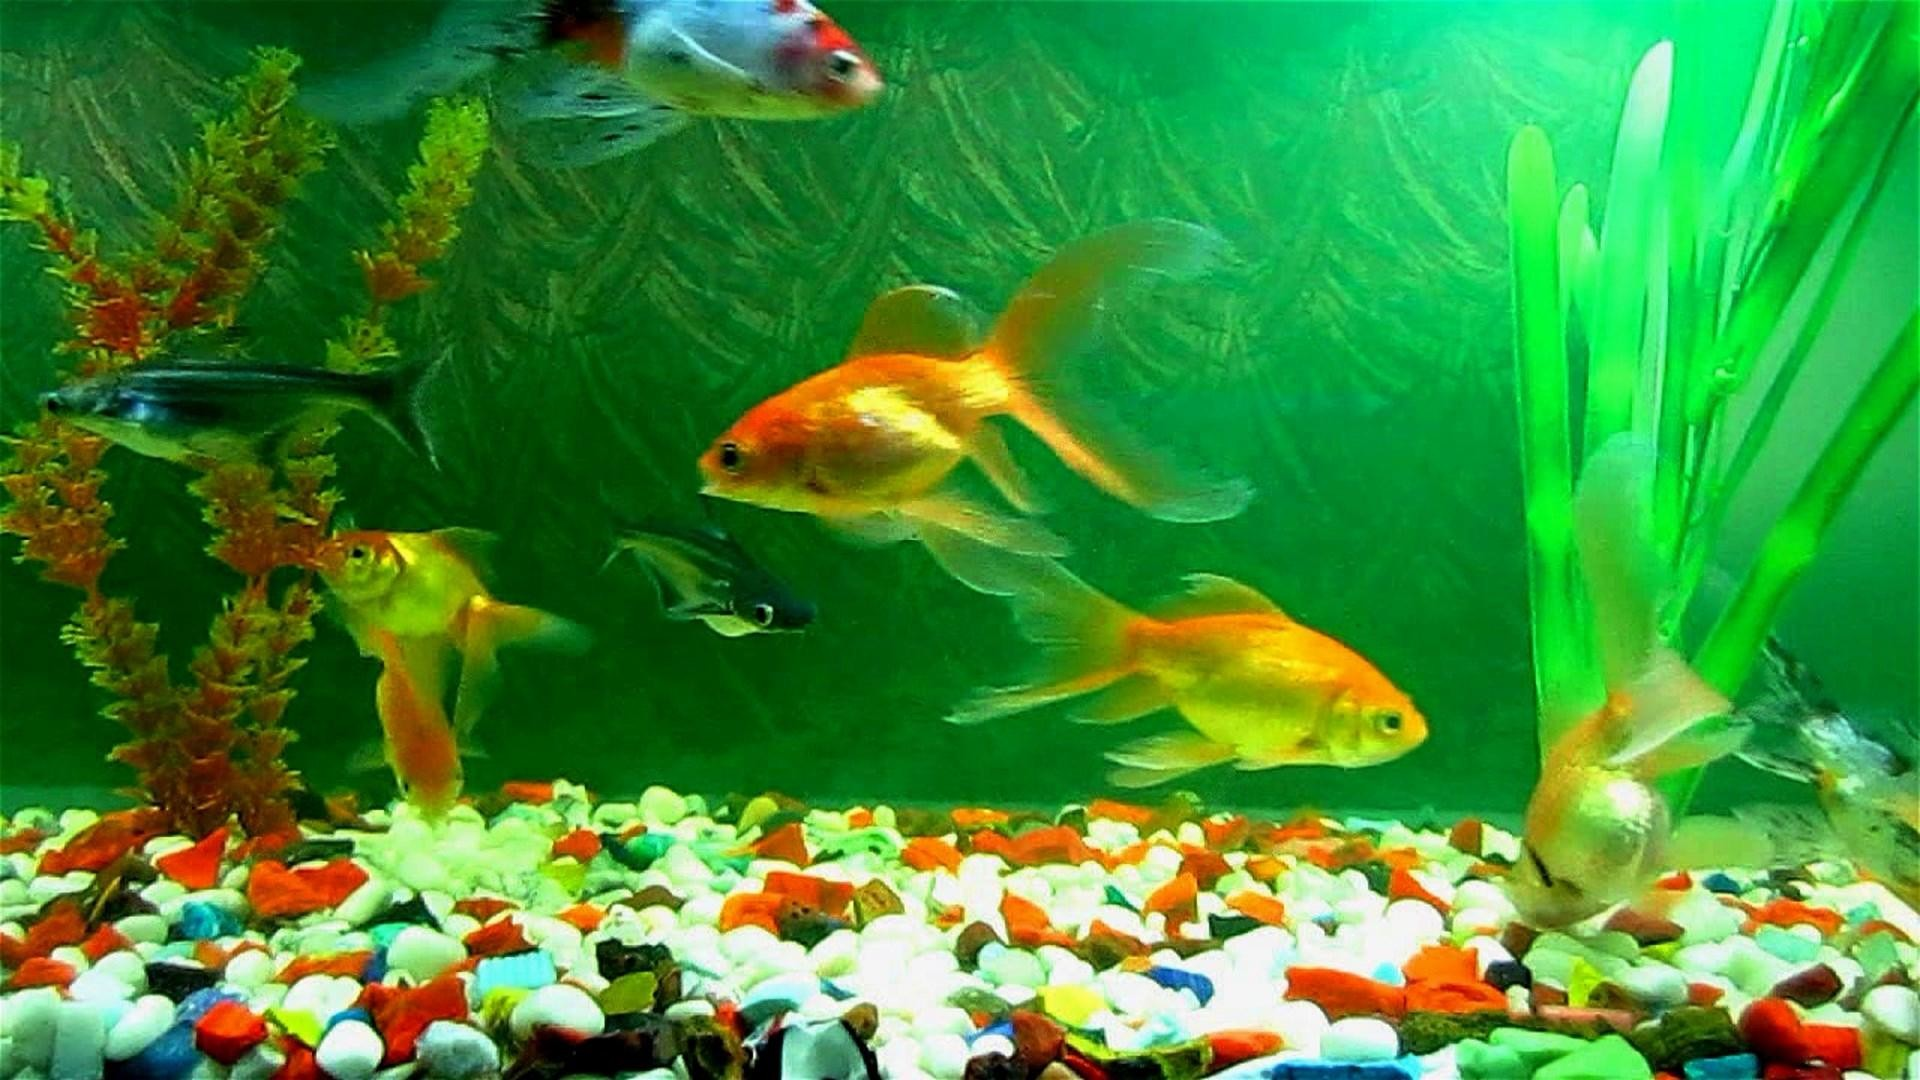 Fish Tank Wallpaper (68+ images)